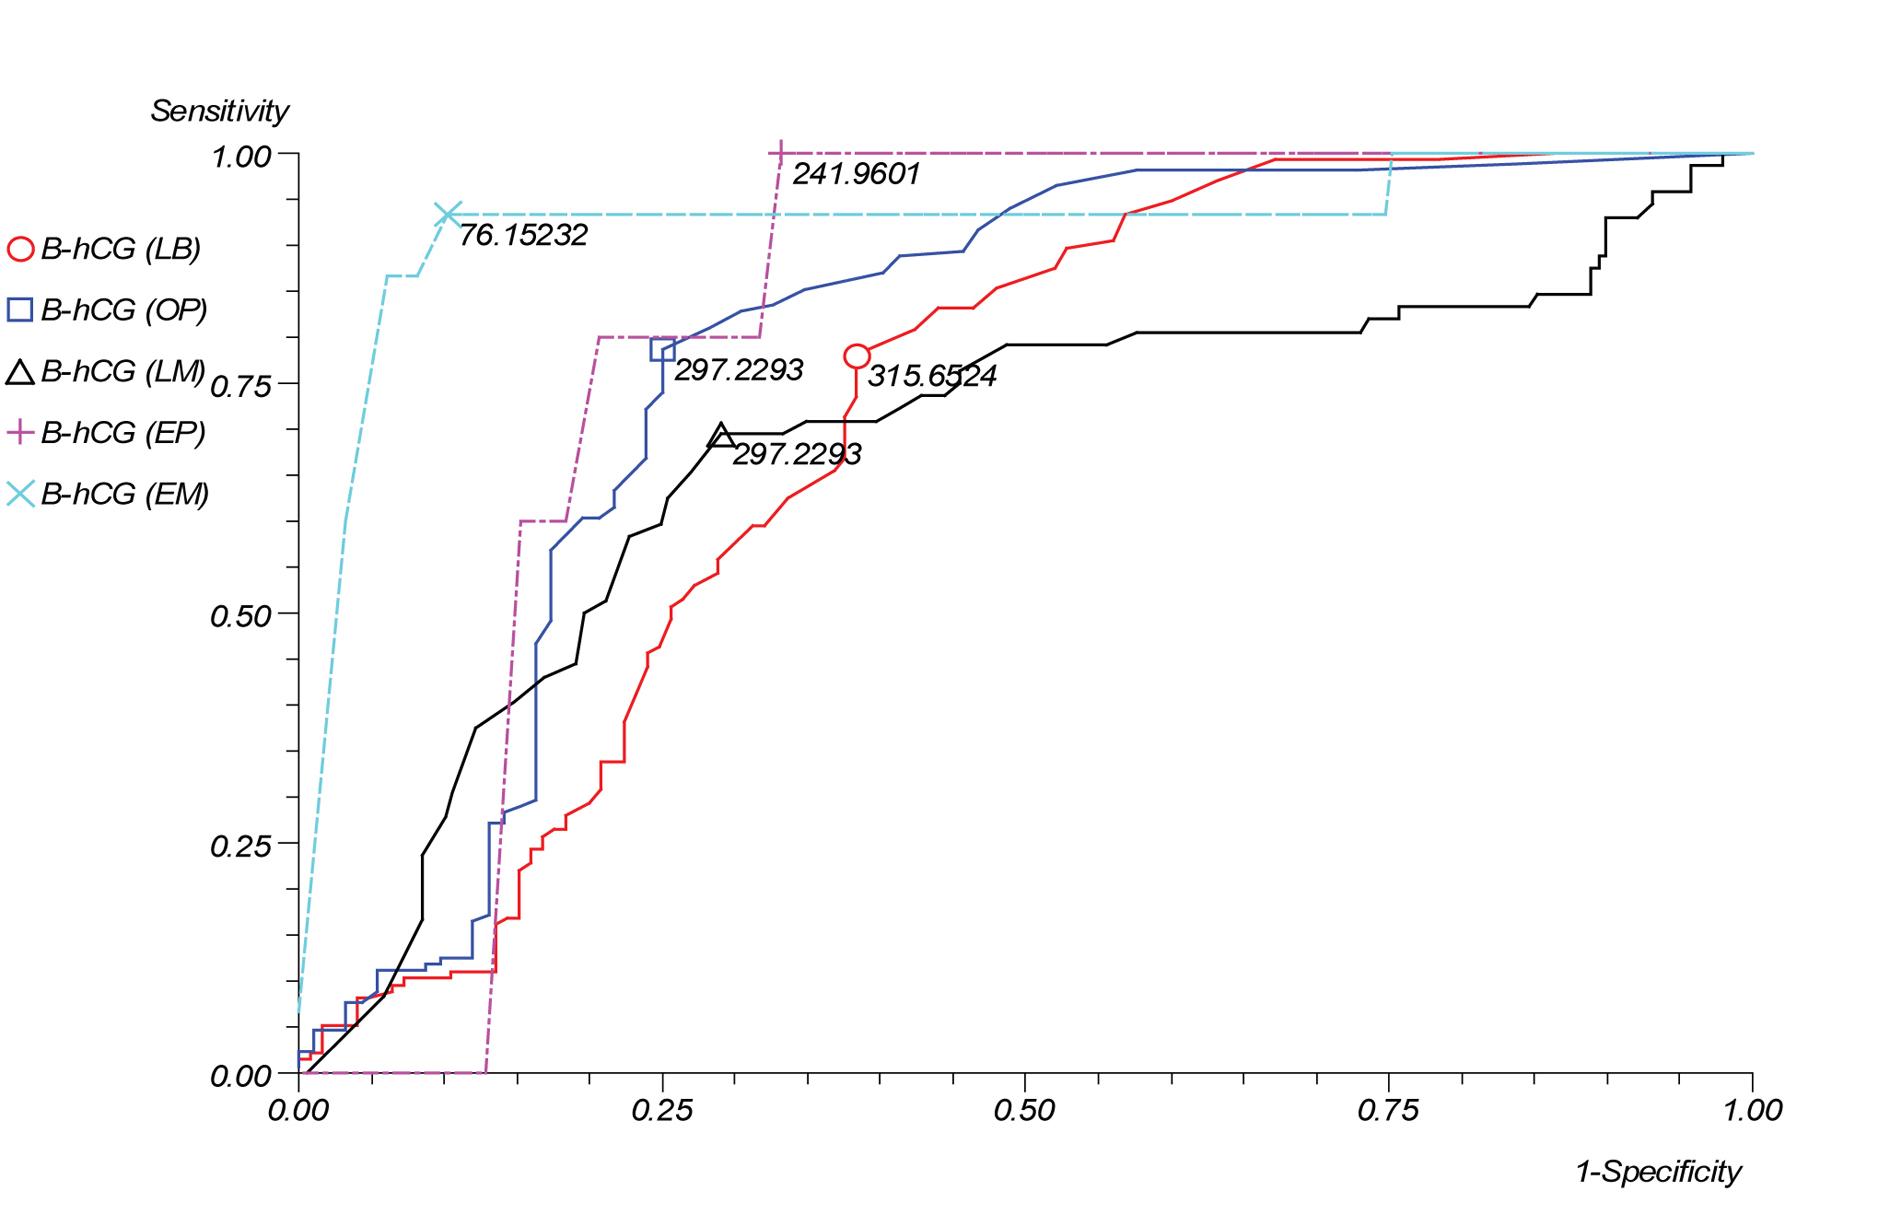 Early Maternal Serum β-human Chorionic Gonadotropin Measurements